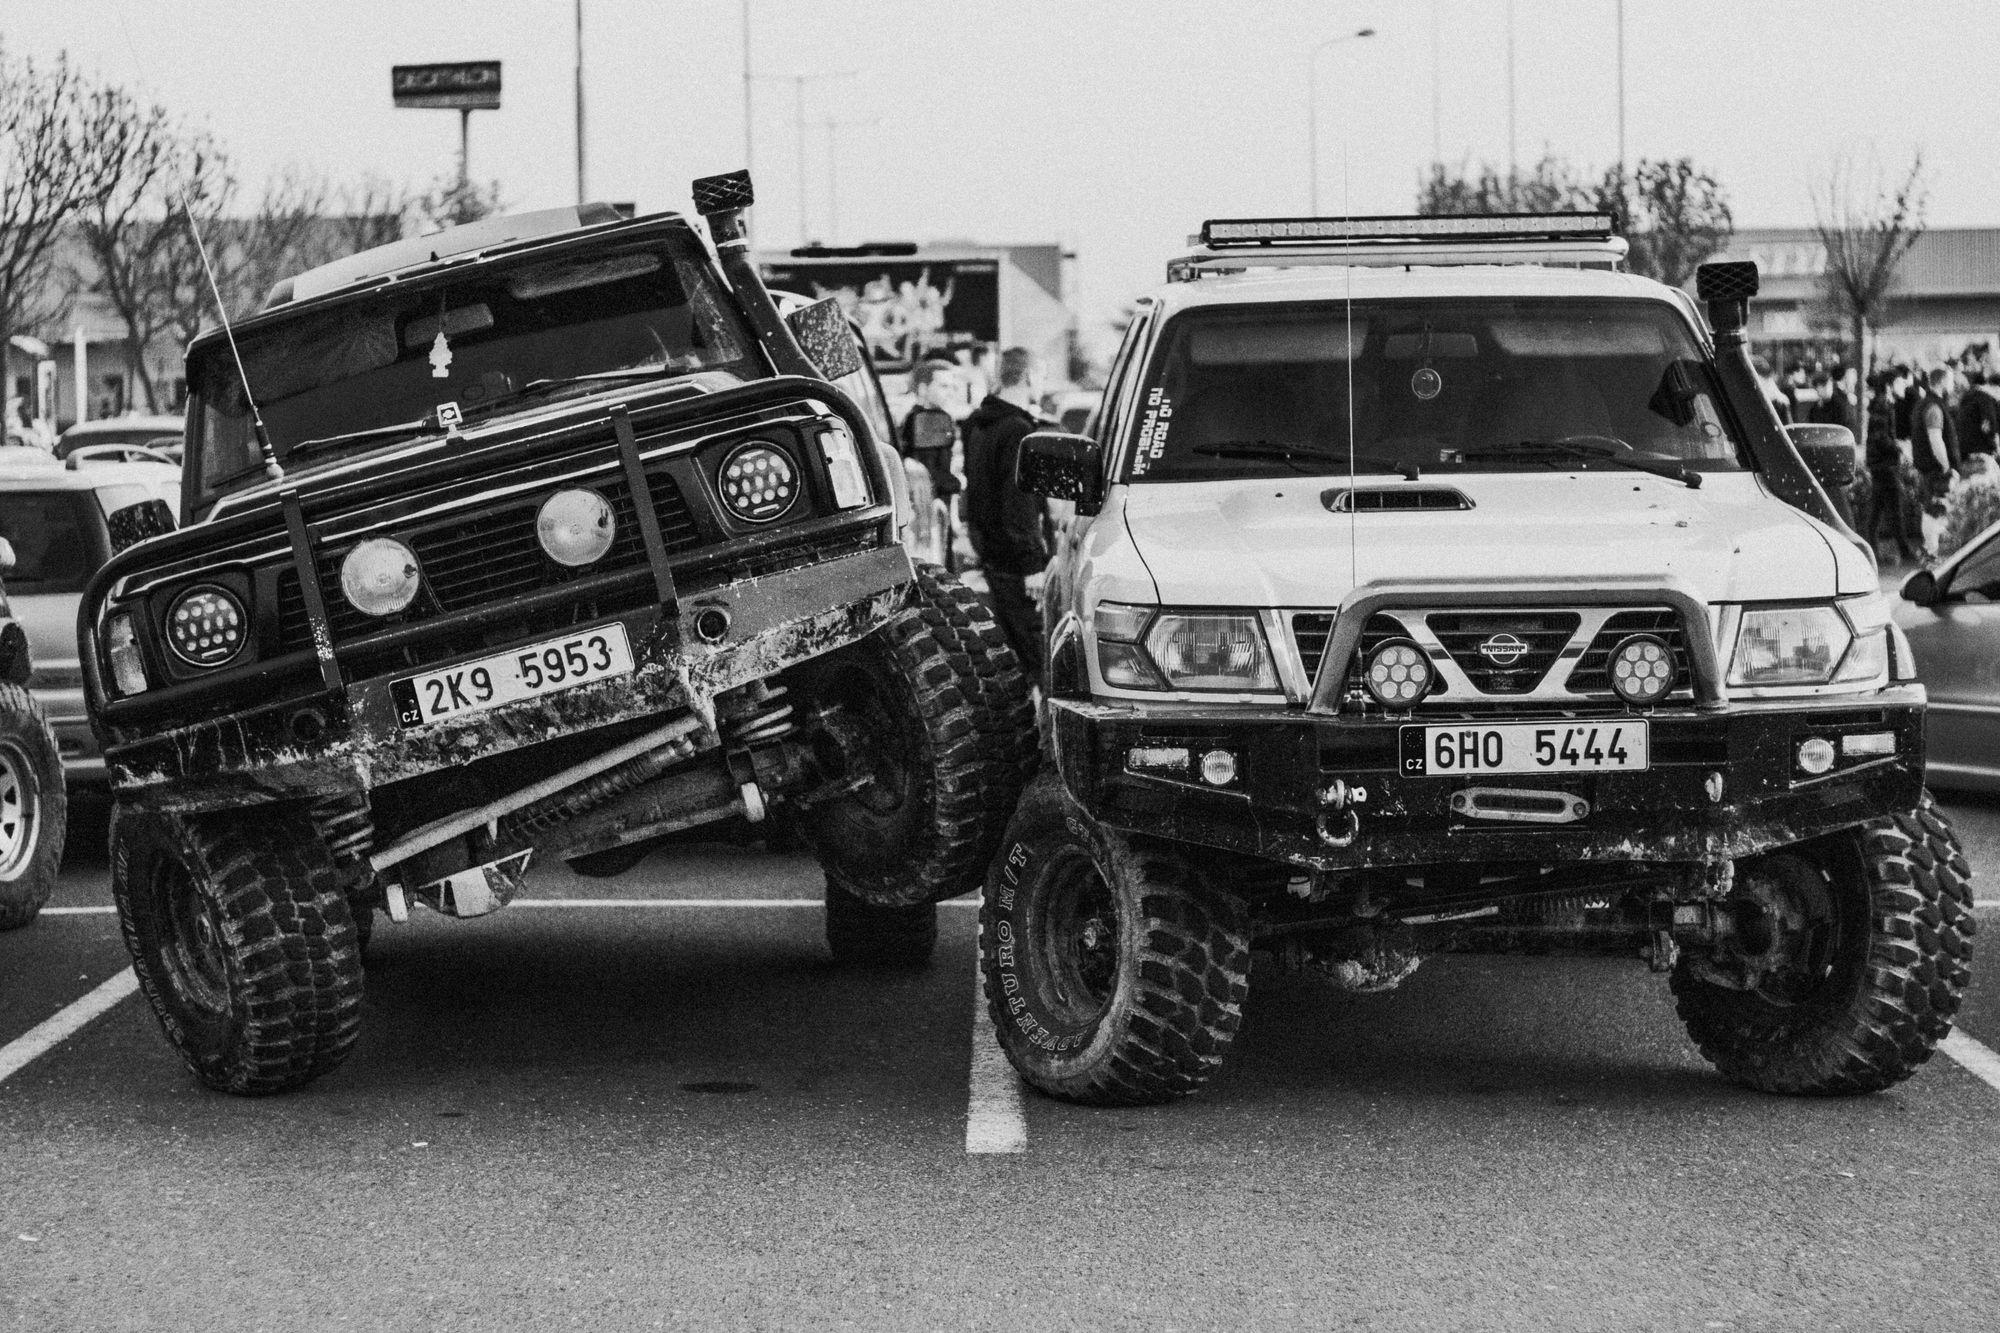 Beastmode Revenge Pickuptruck Classictruck Truck